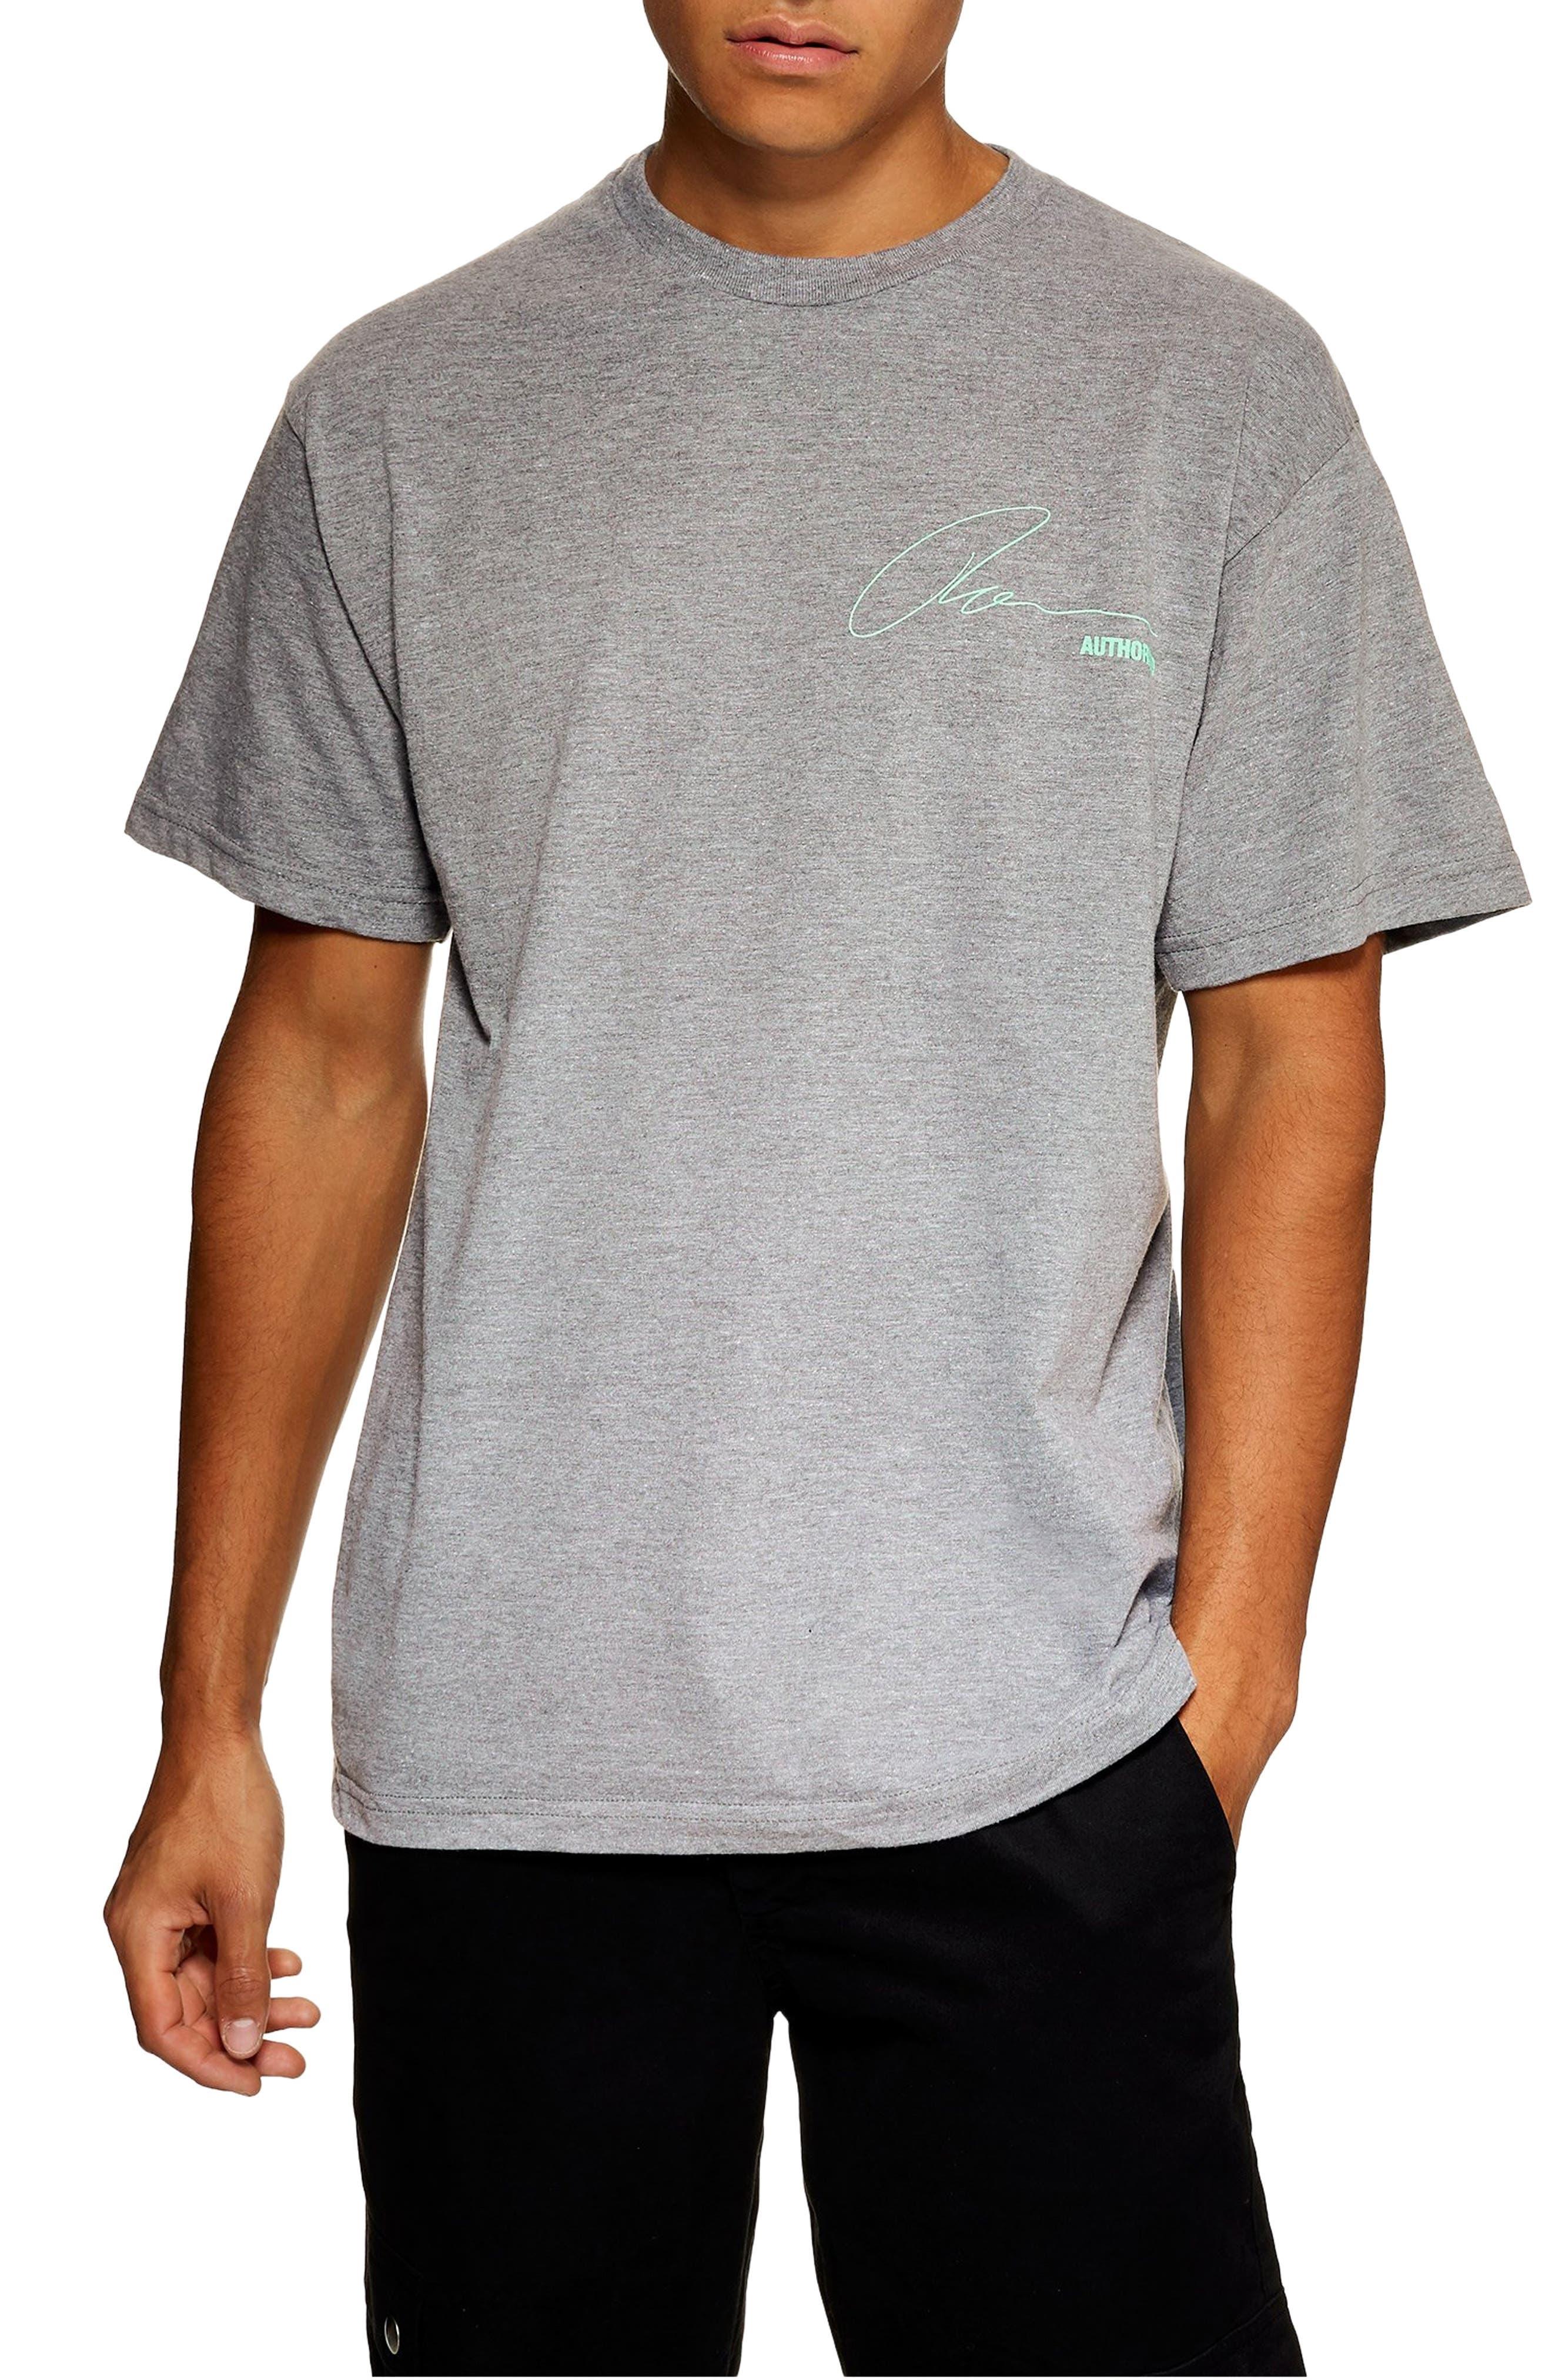 Explicit Content T-Shirt,                             Main thumbnail 1, color,                             GREY